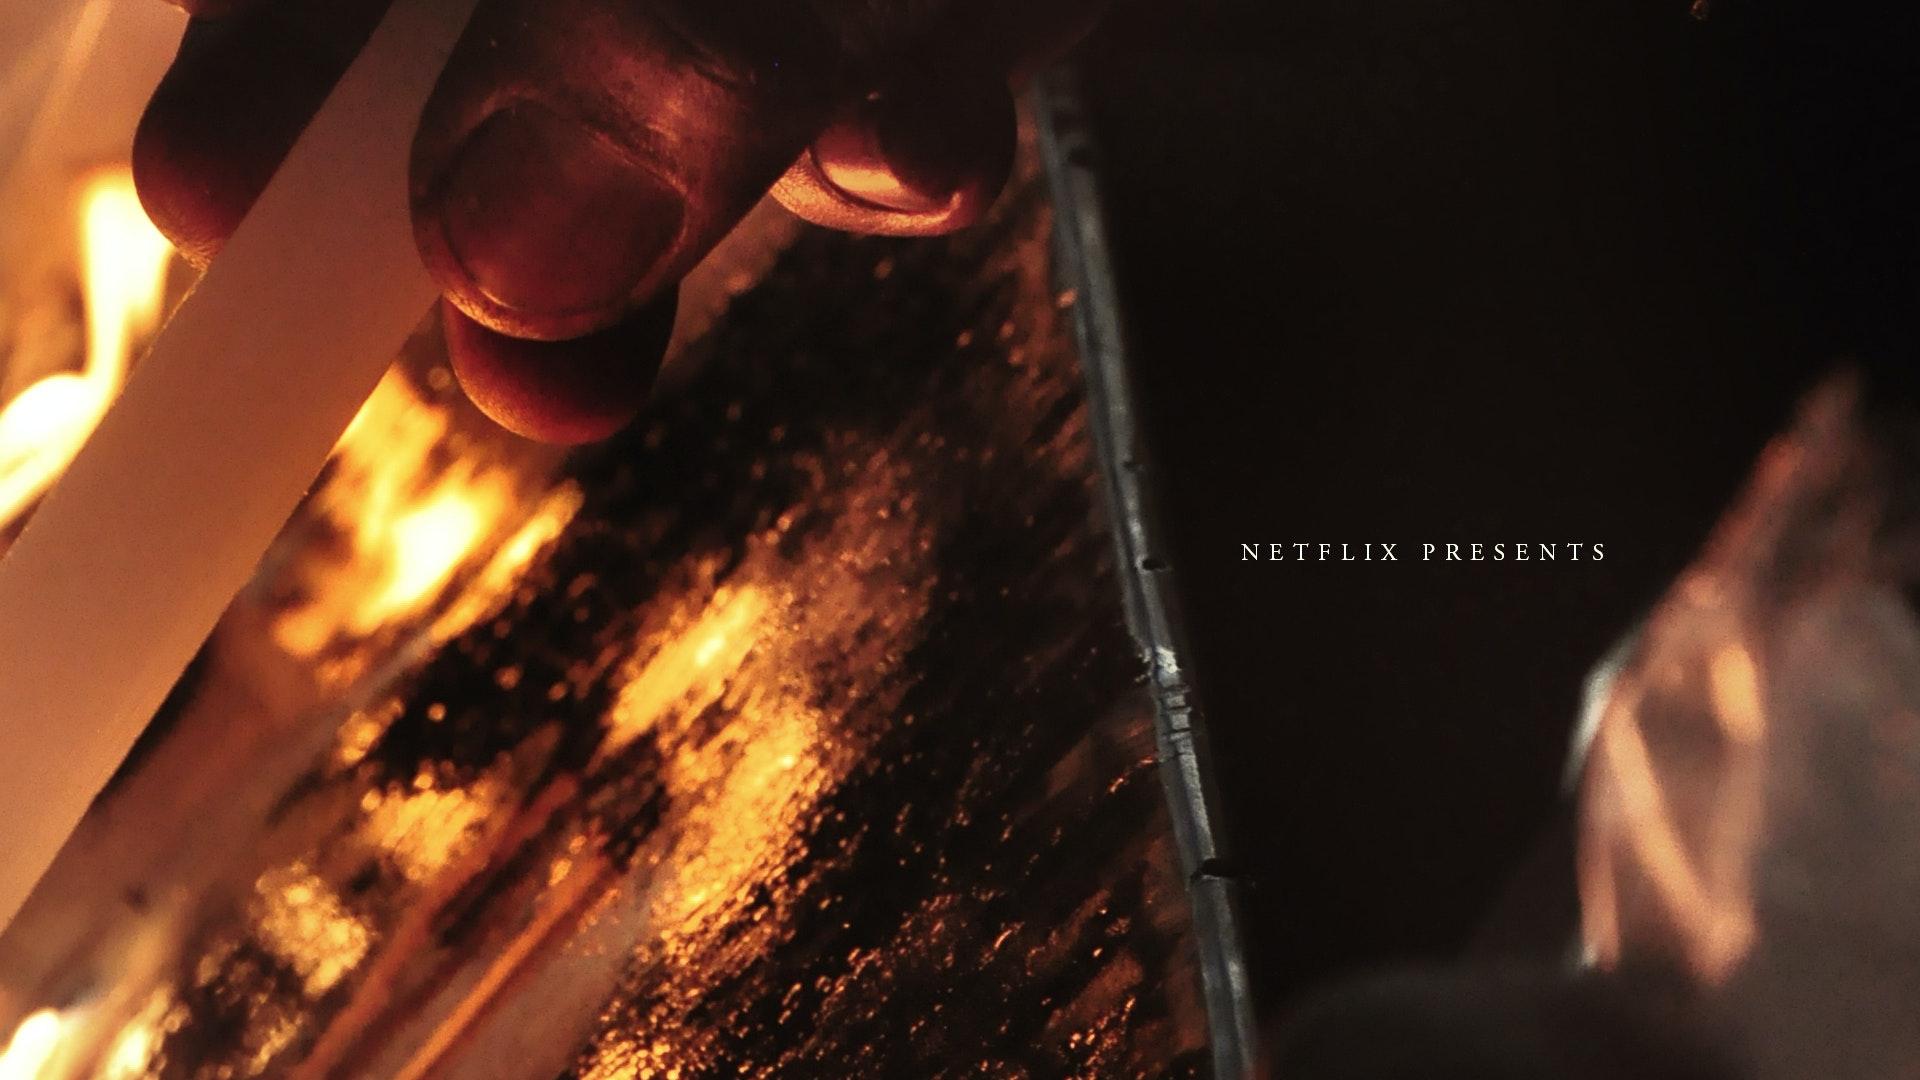 VINICIUS NALDI - A_Fearless_Heart_vinicius_Dir1_1